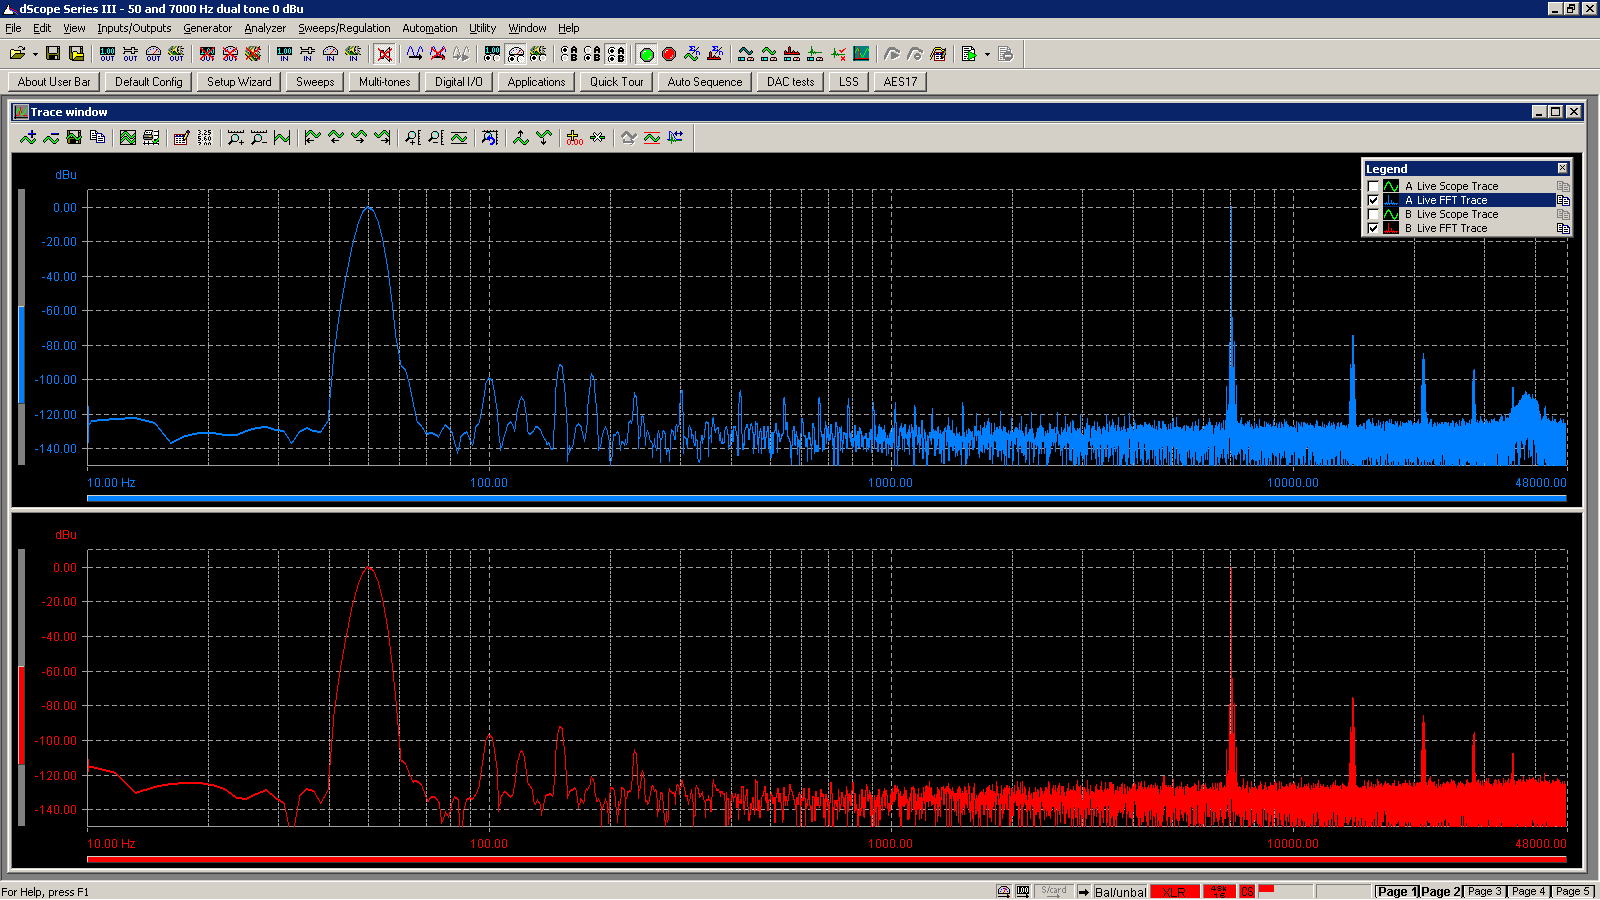 20151214 LiqCarb 50+7000Hz dual tone 0dBu 30R.png